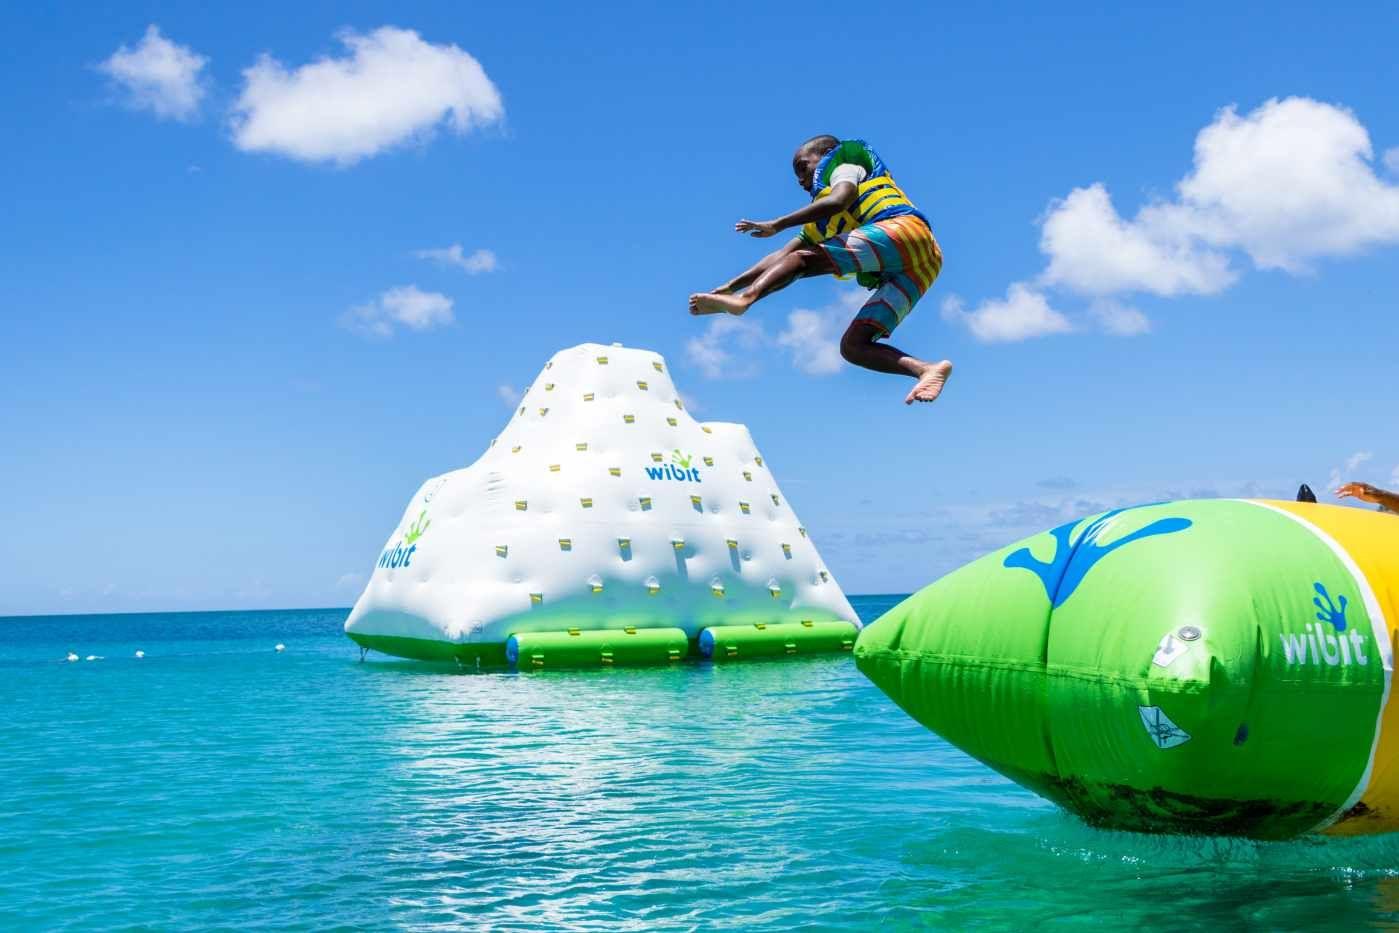 8033994747dce3500926c08bdd5df544 - Bay Gardens Beach Resort Day Pass Reviews